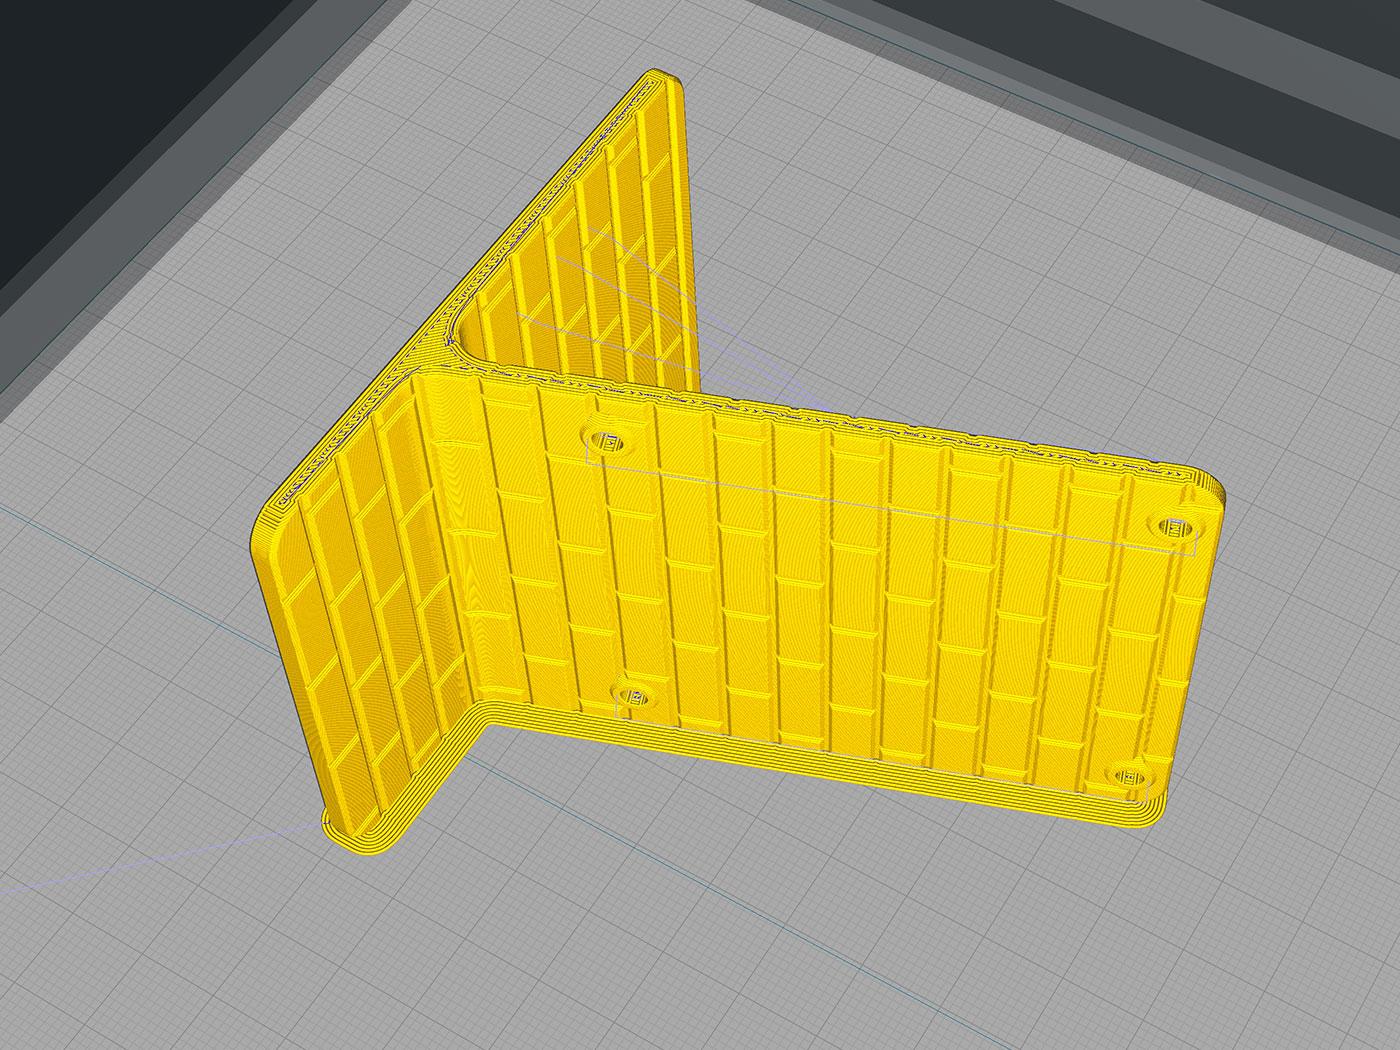 3d_printing_slice-orientation.jpg